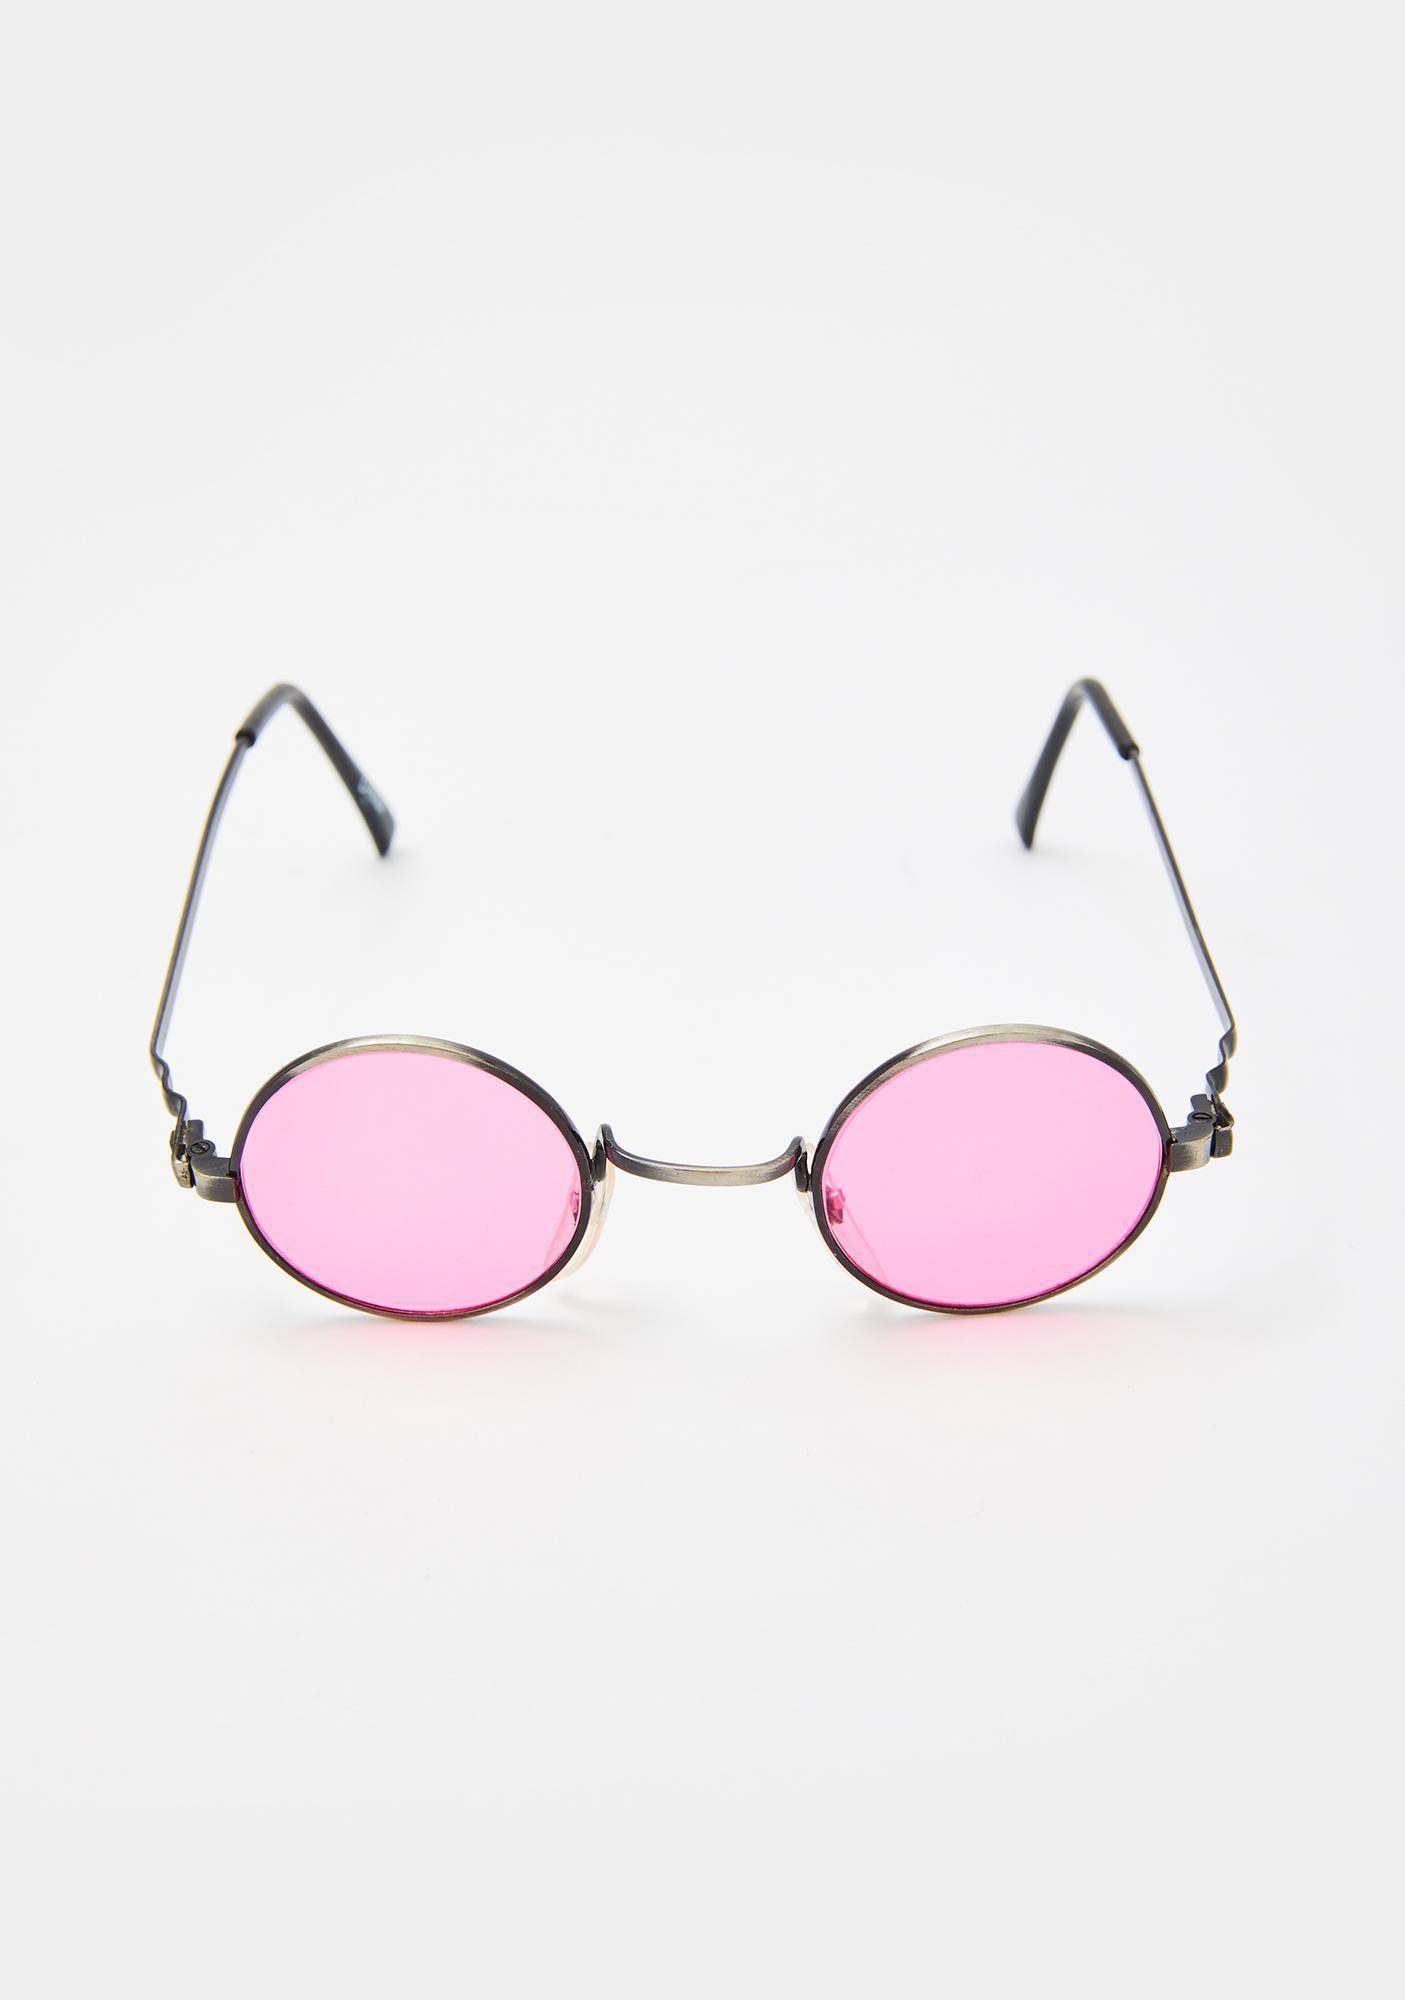 Good Times Eyewear Pink Rounders Sunglasses